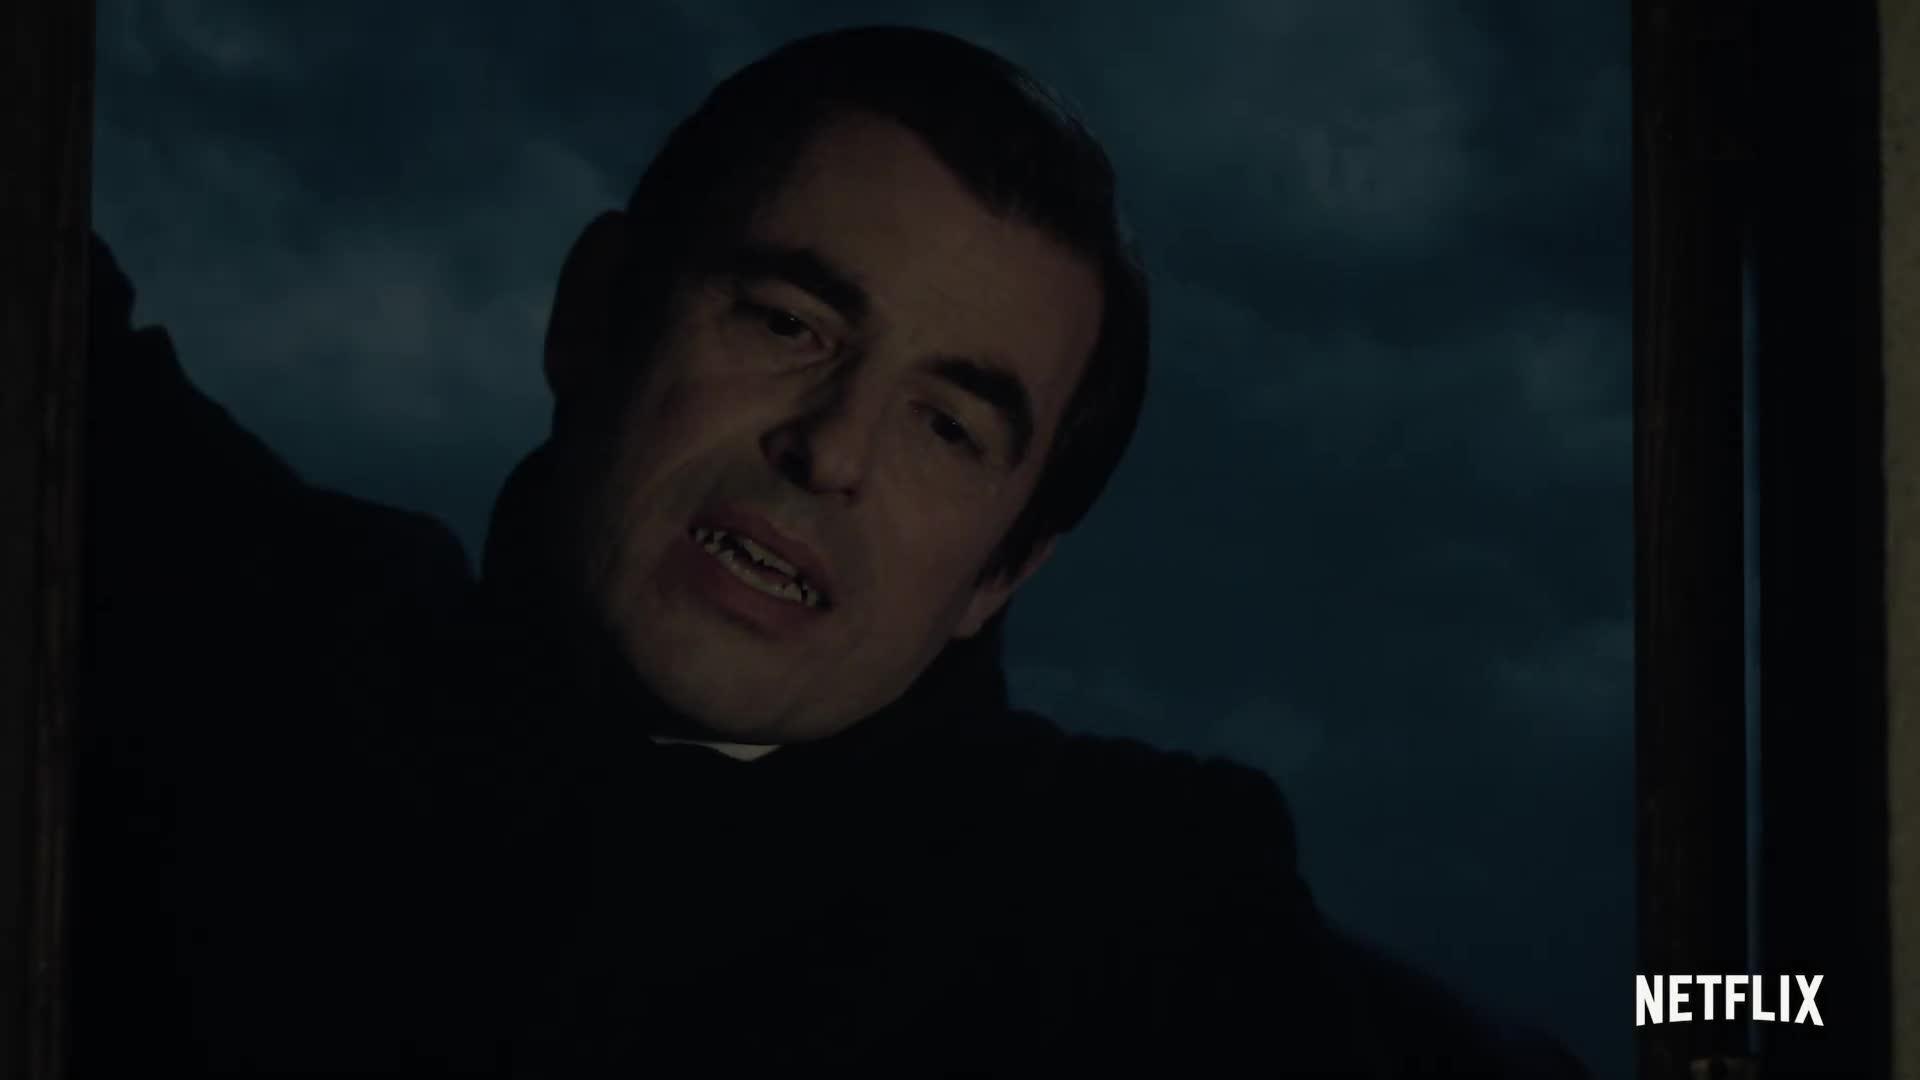 Trailer, Netflix, Serie, Horror, Bbc, Dracula